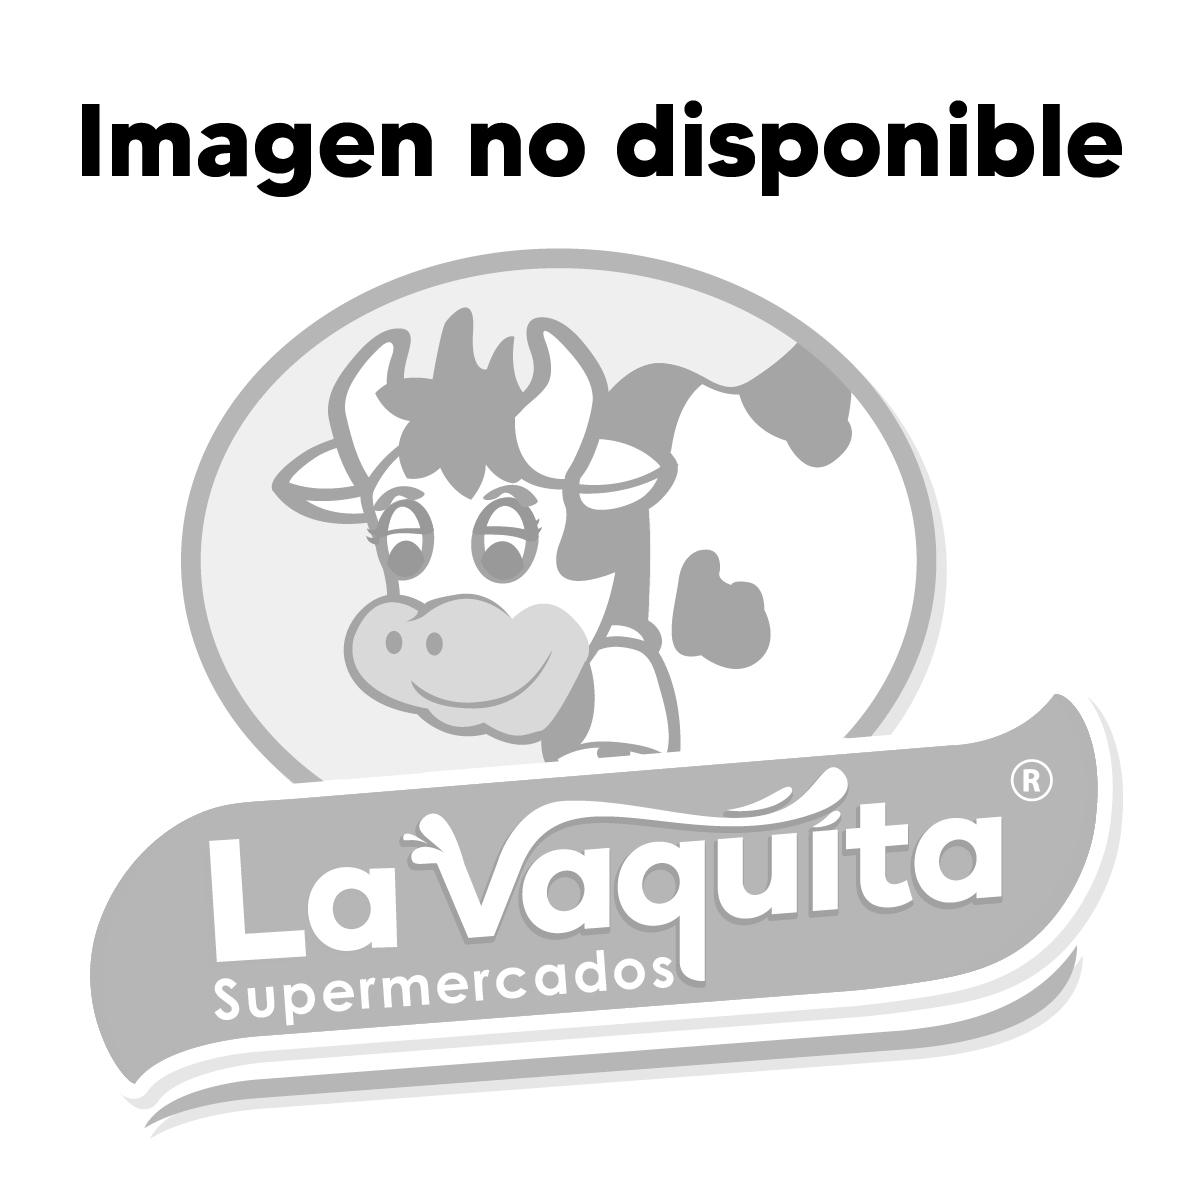 COPITO MK PAG 100U LLEVE 140U CANISTER